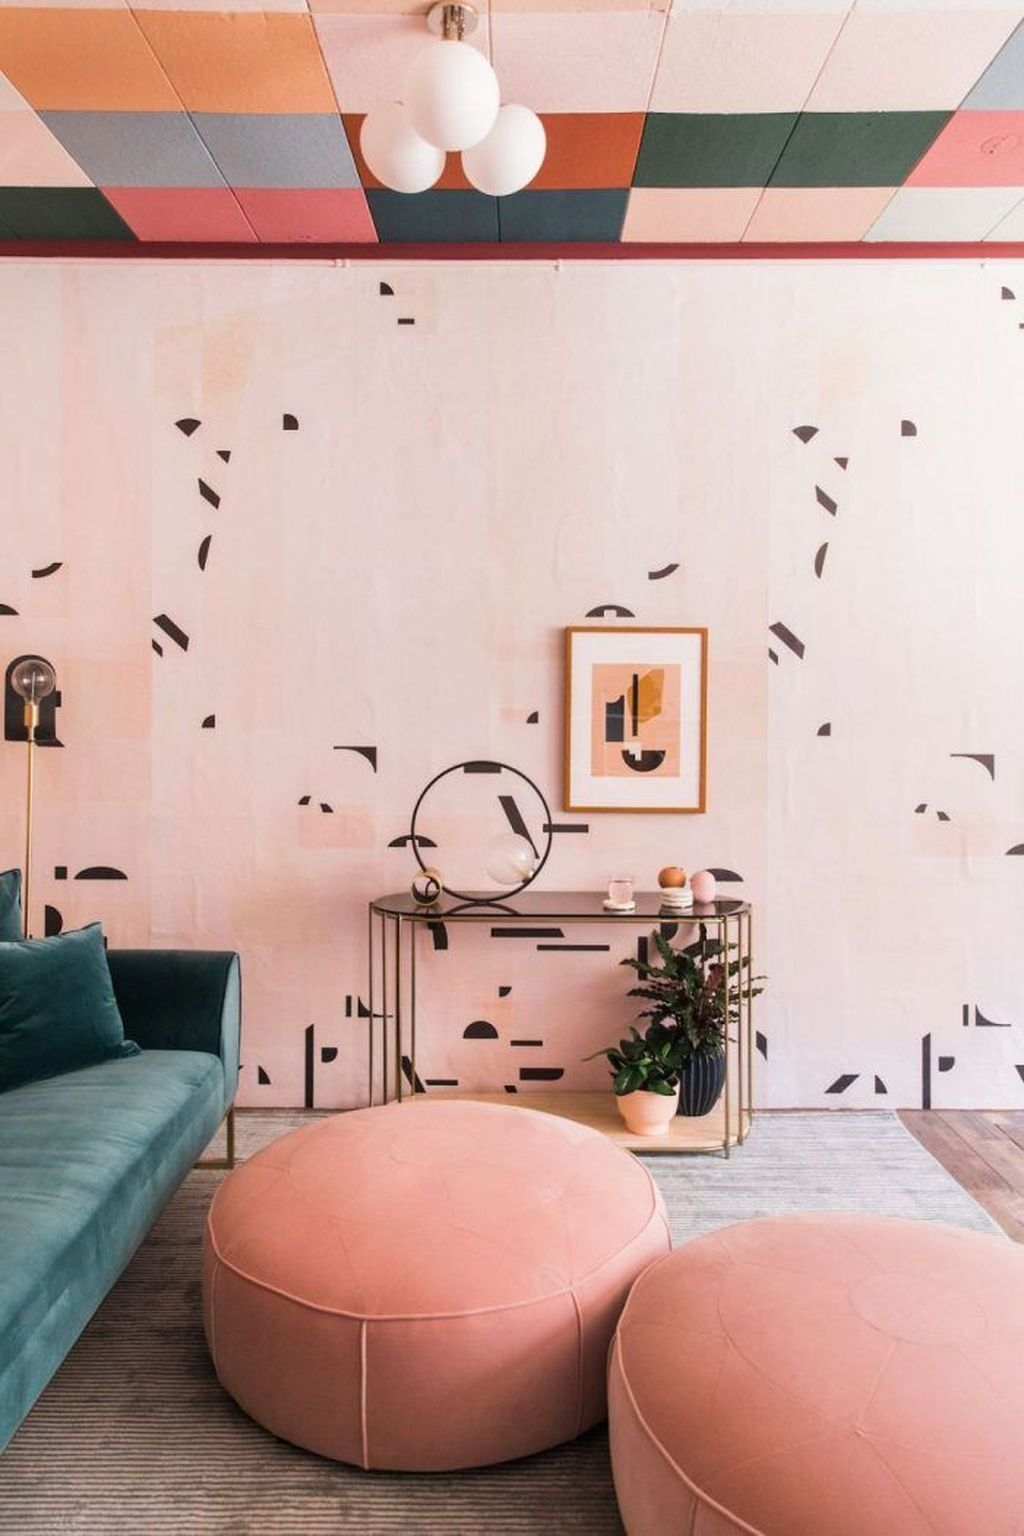 Inspiring Modern Home Furnishings Design Ideas 12